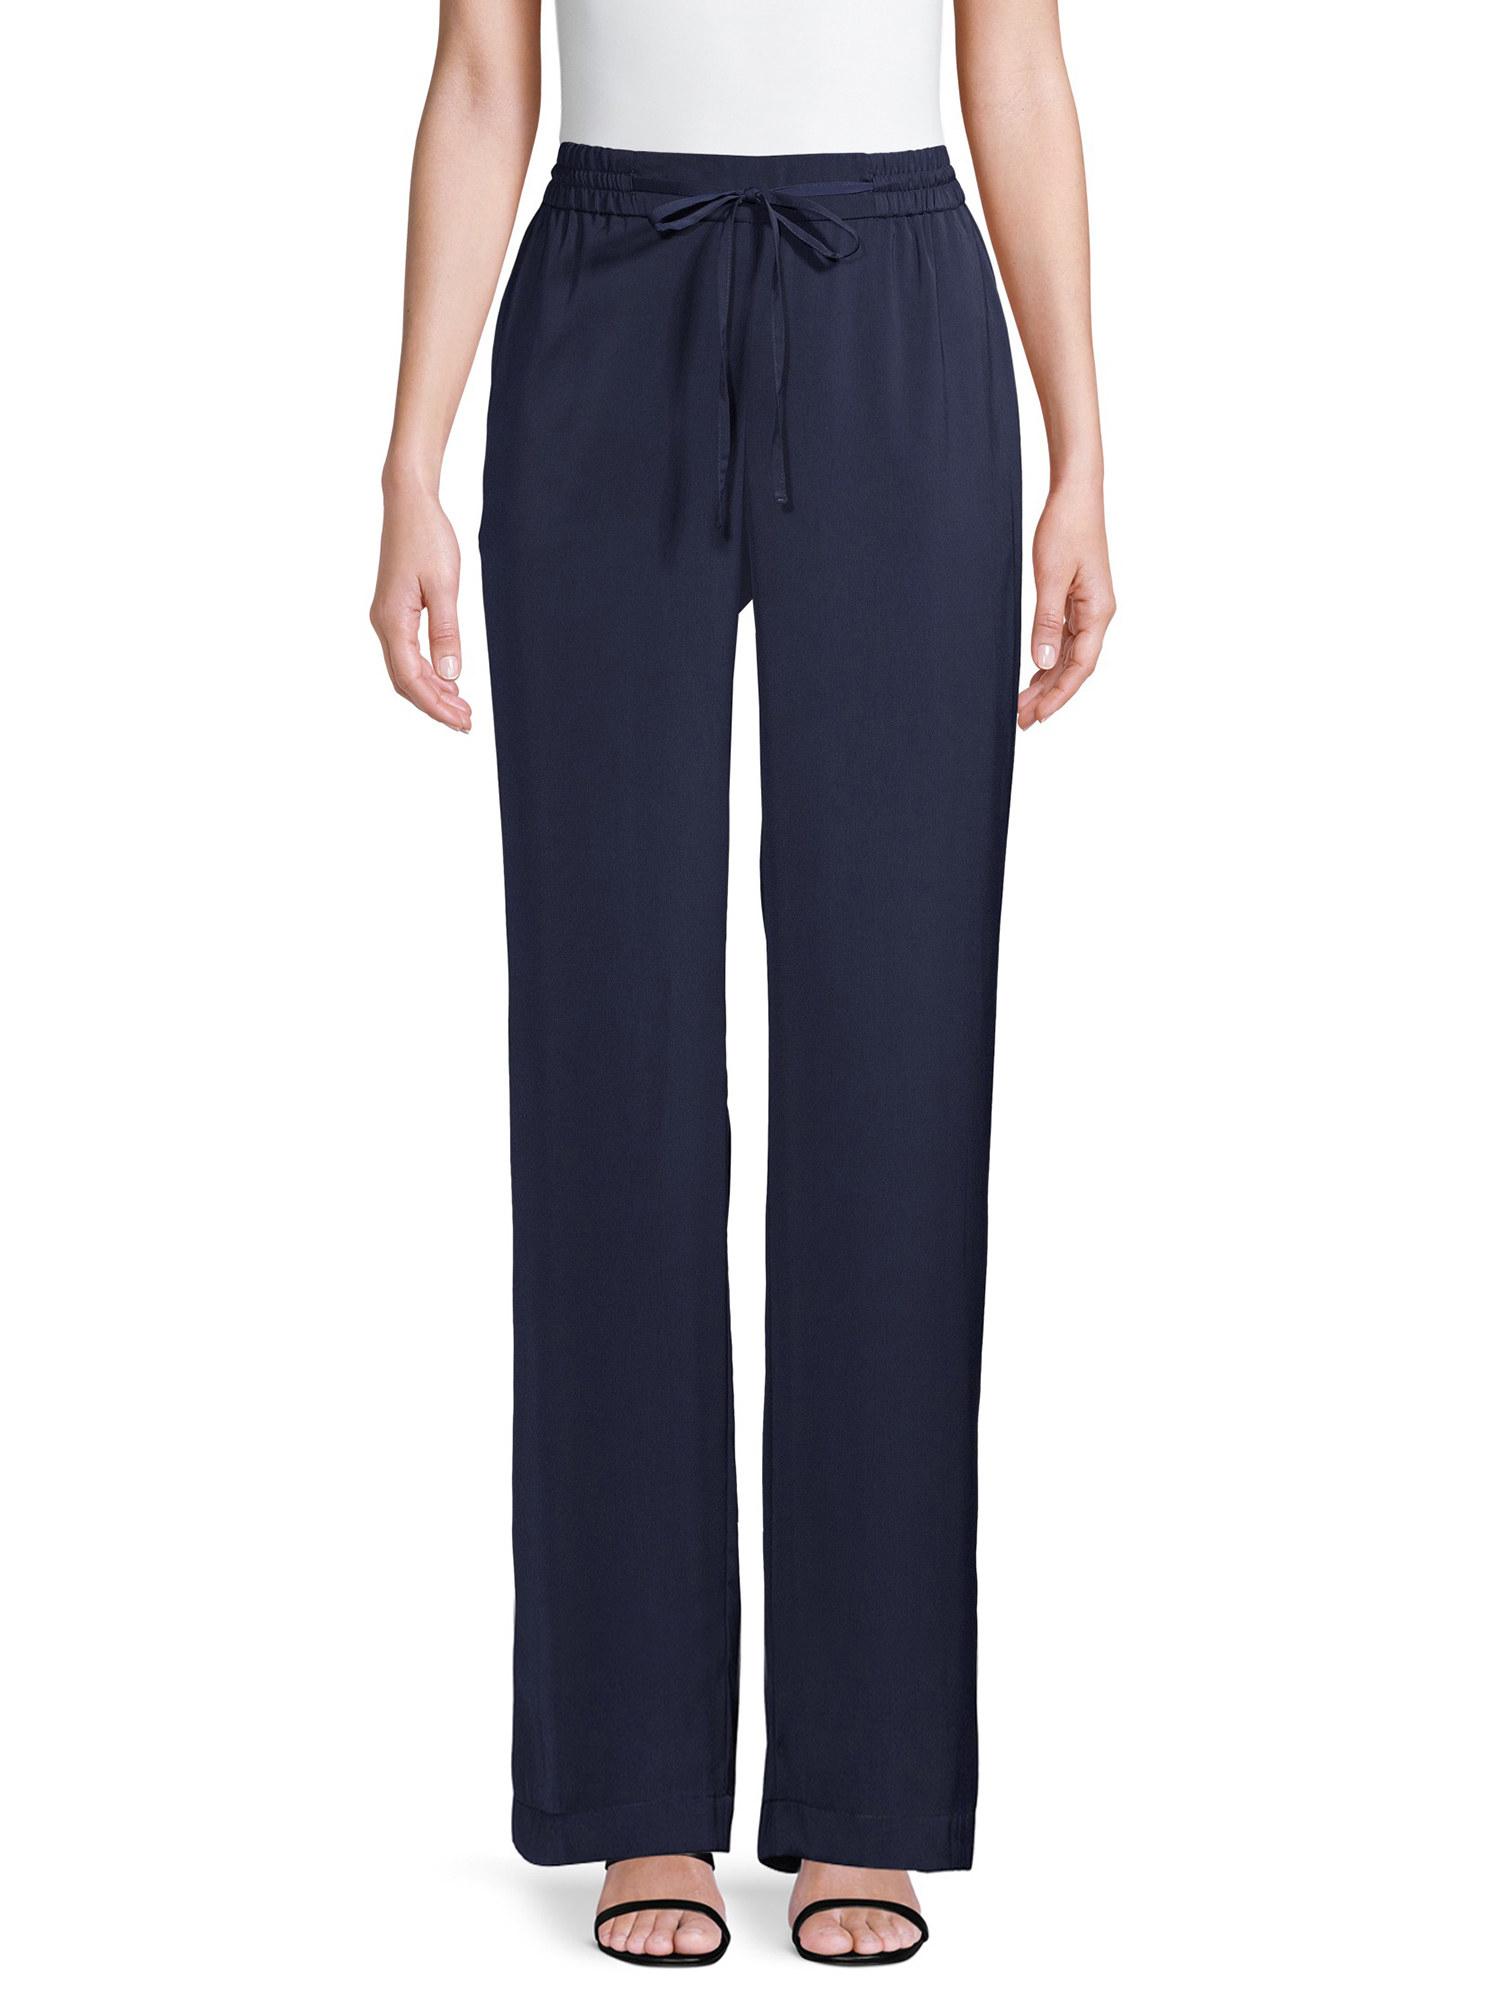 model wearing navy pants